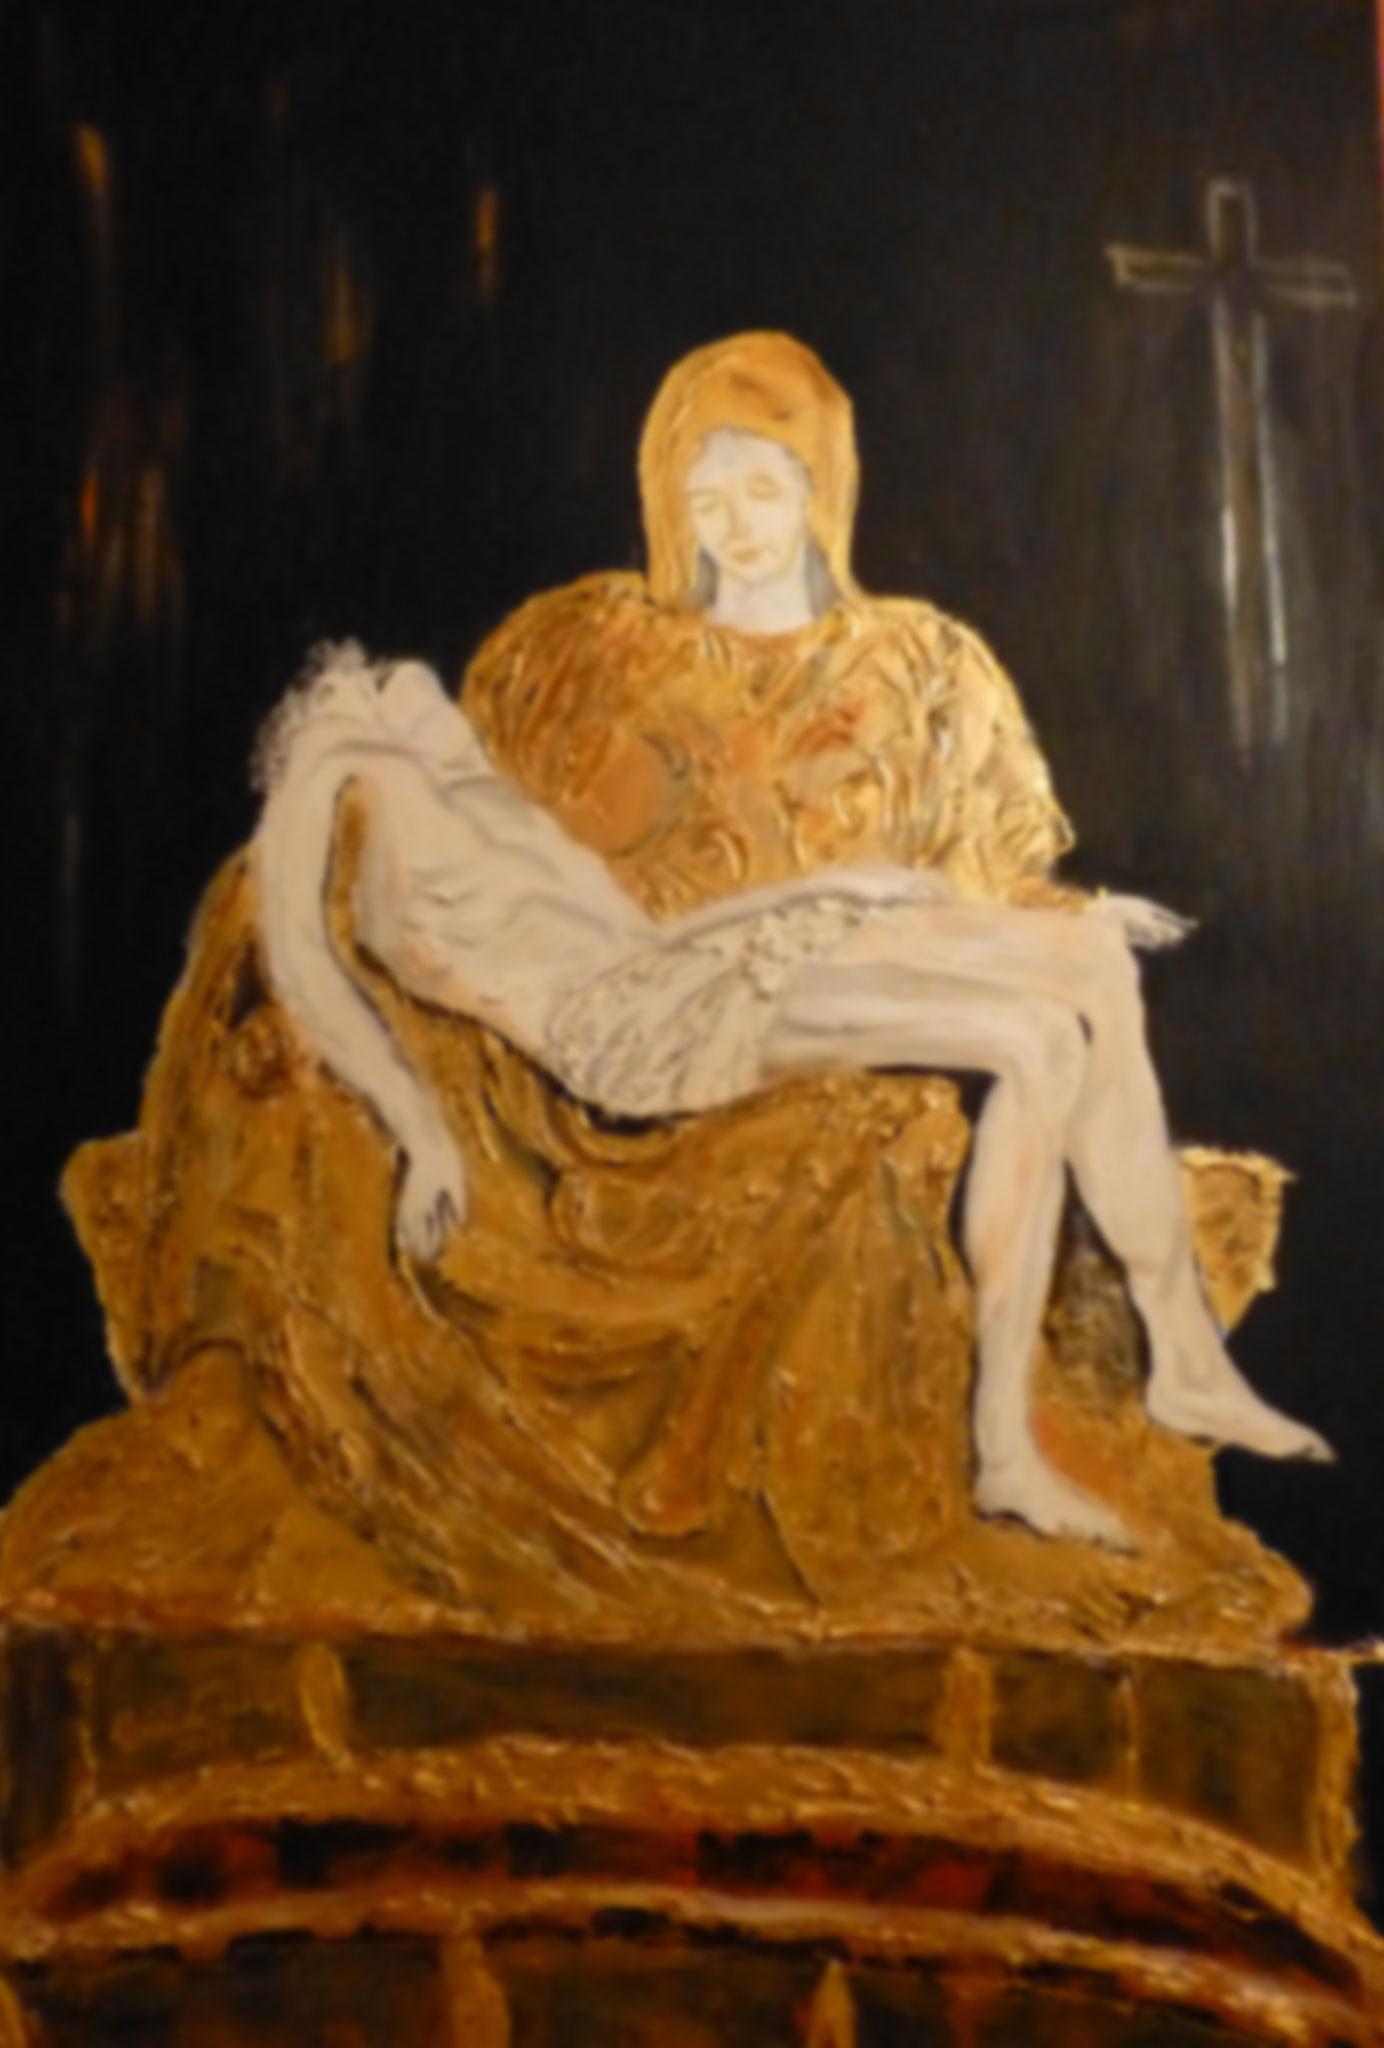 Pietà        (Technik: Acryl/Mixed Media   auf Leinwand  1,20 m X 90 cm)